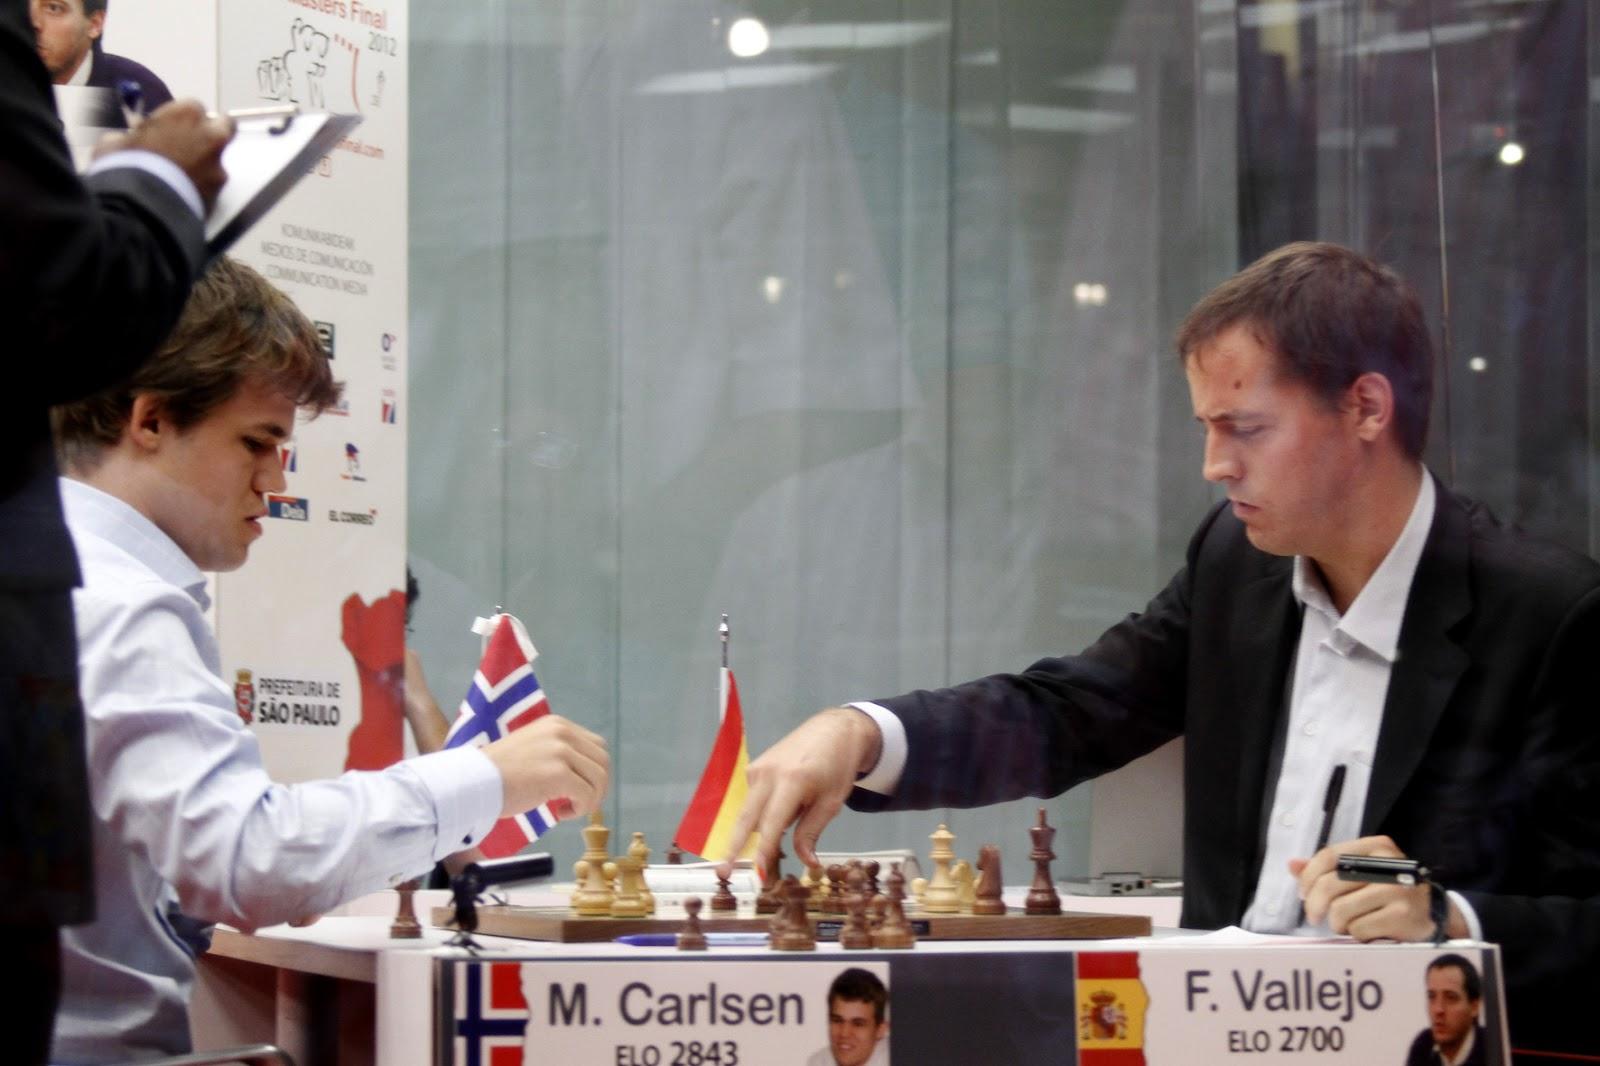 Aronian karjakin chess masters bilbao 2012